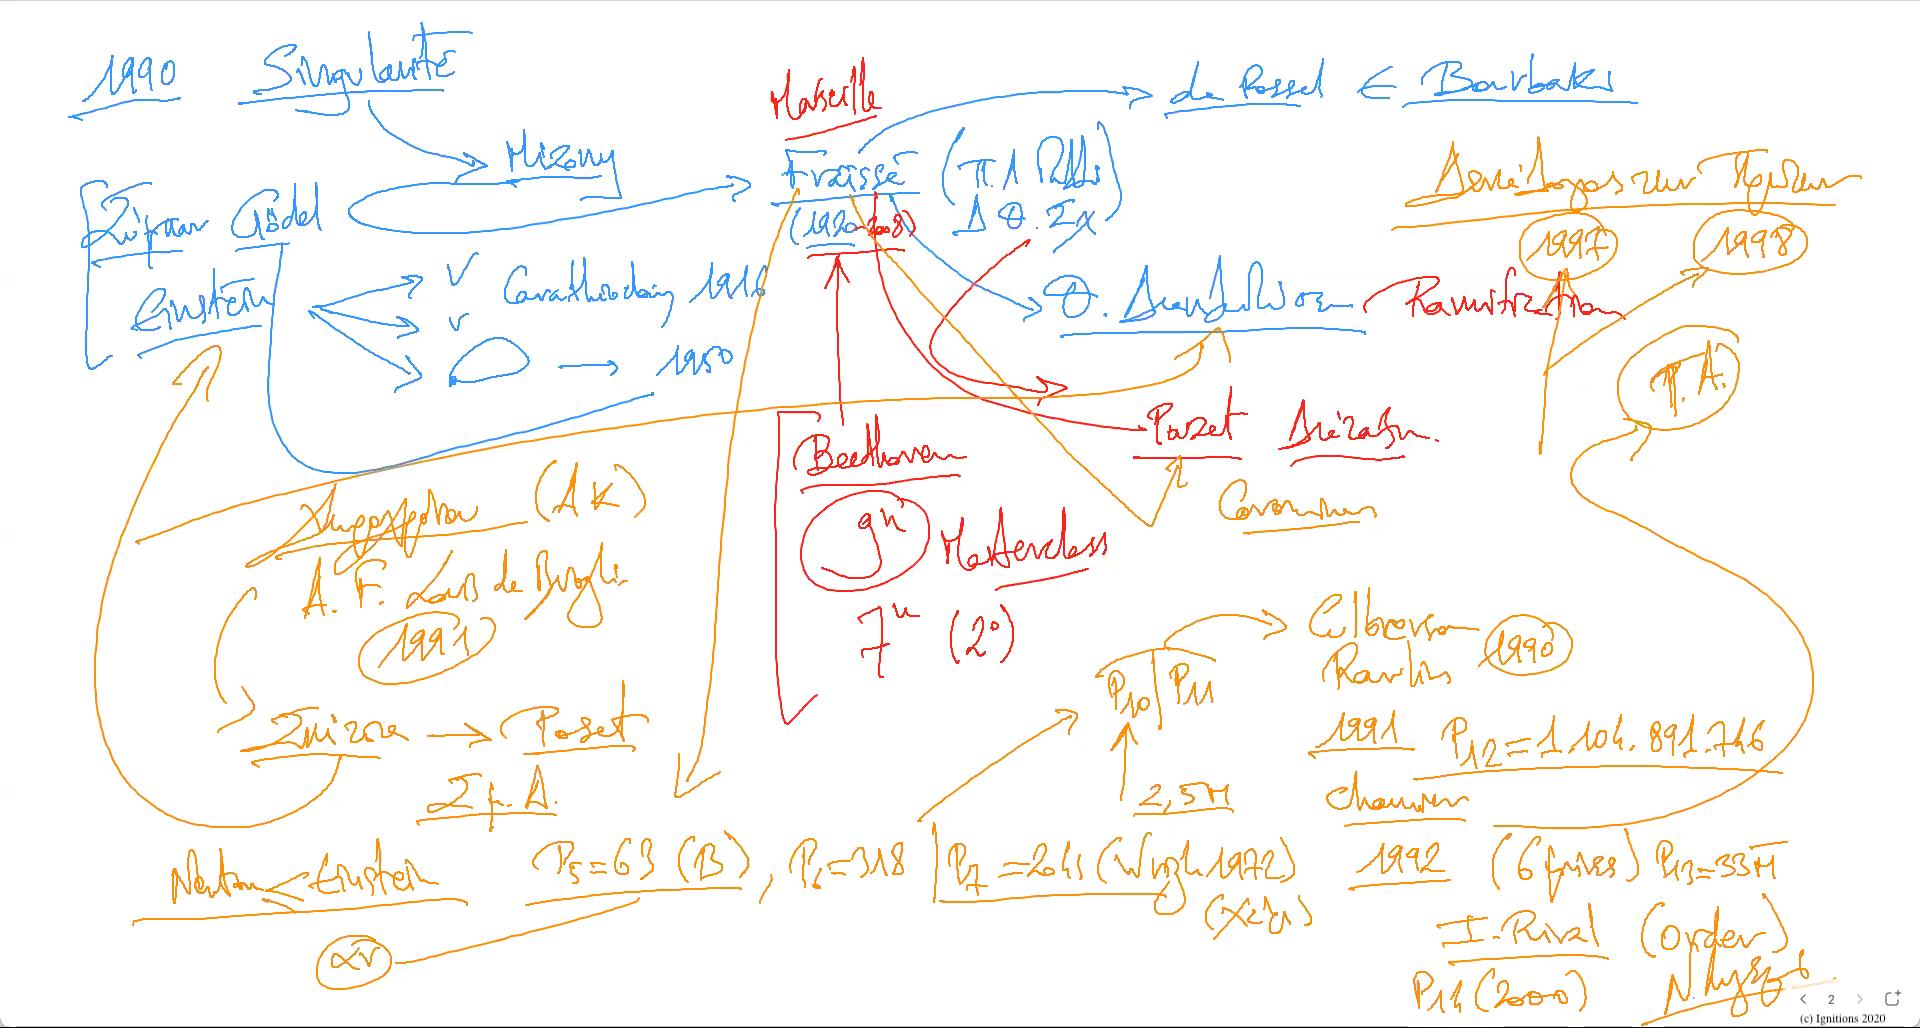 57297 - VI - Το Μαθηματικό Έργο της Ανθρωπότητας. Έργο IX. (Dessin)